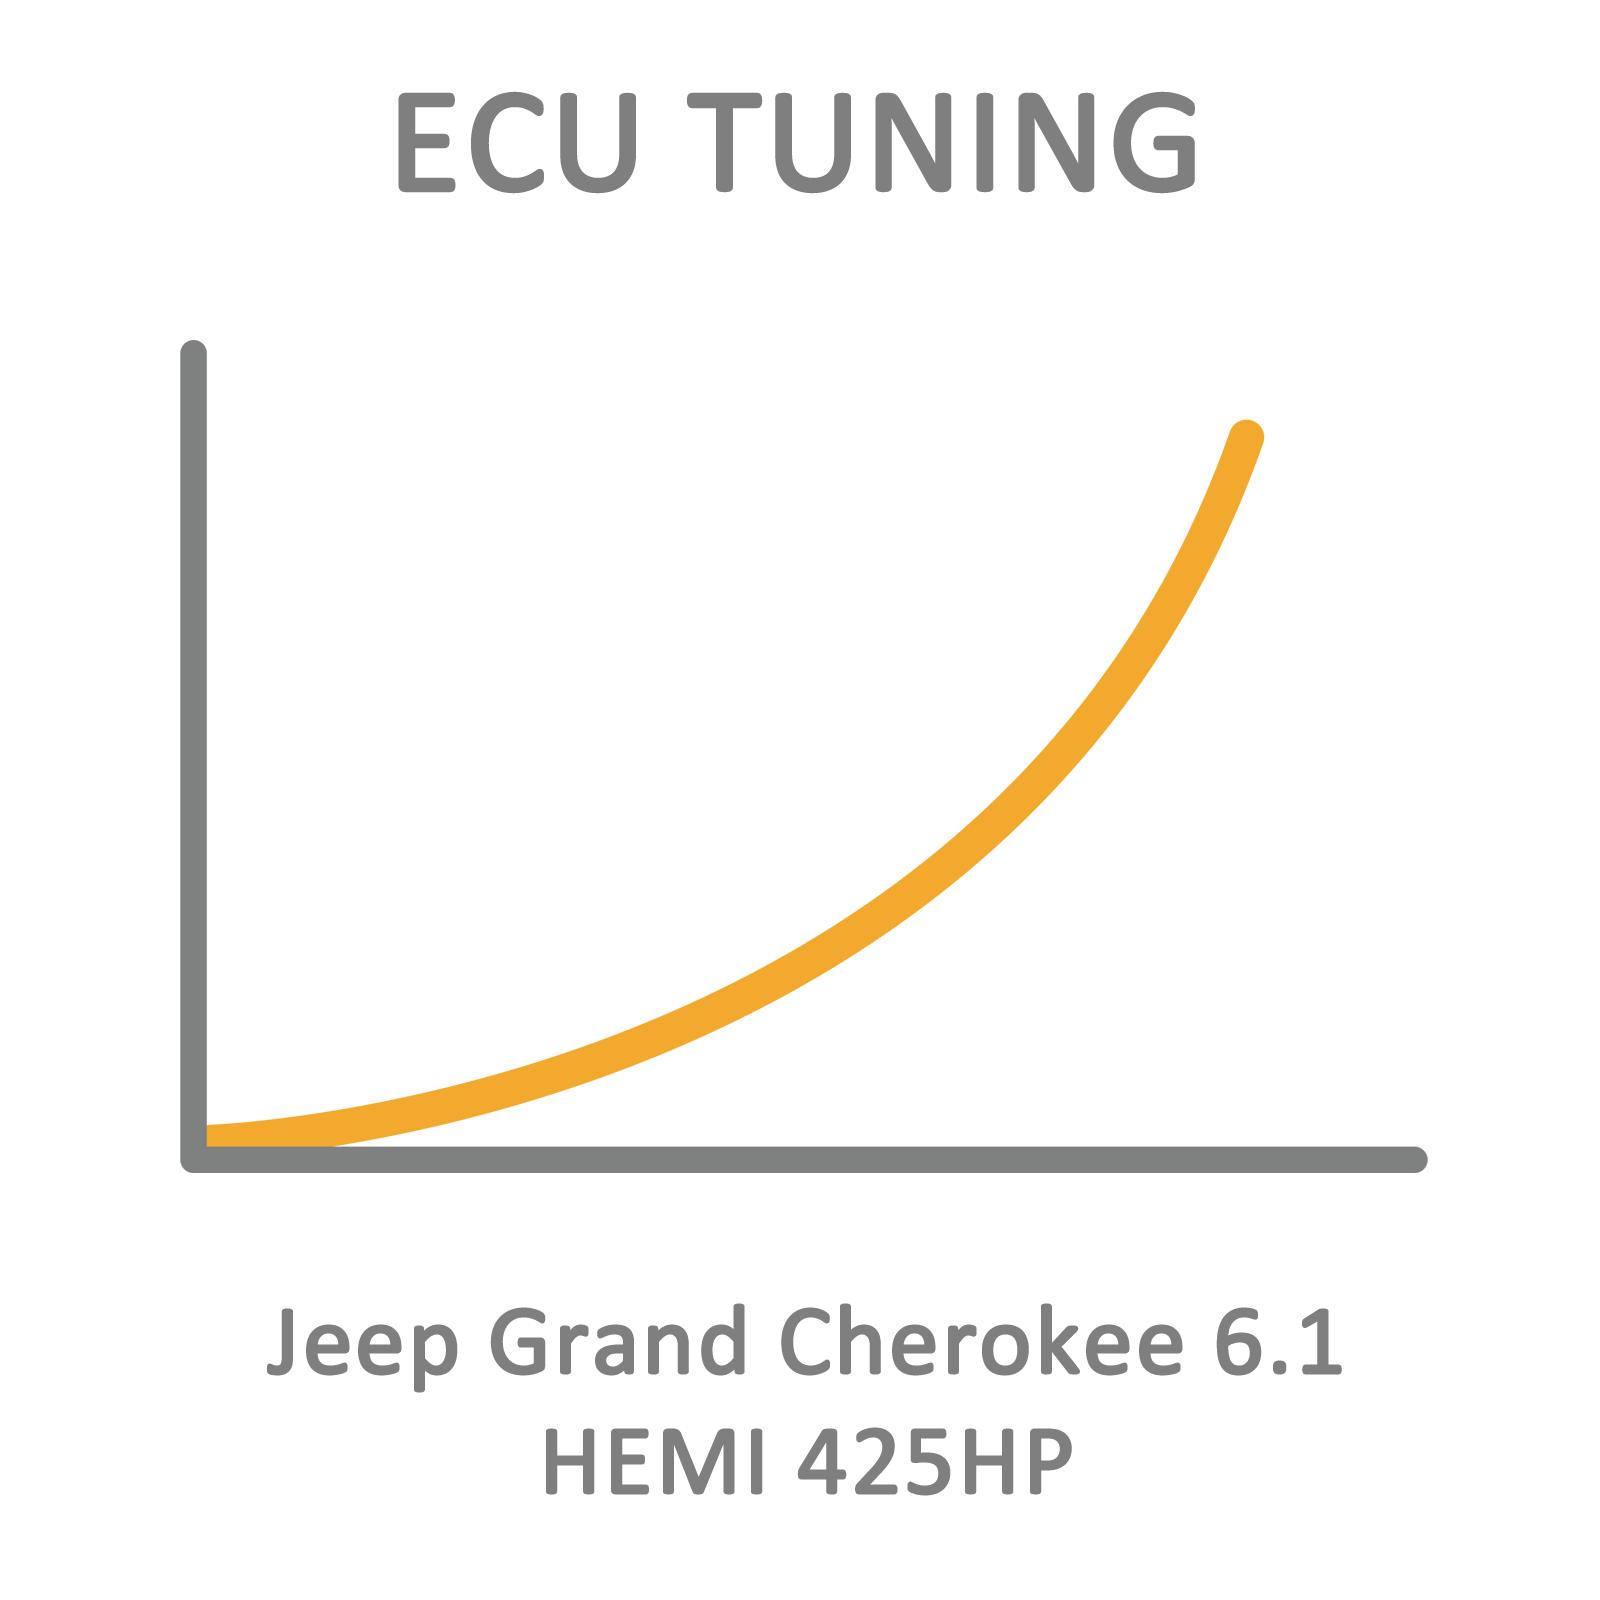 Jeep Grand Cherokee 6.1 HEMI 425HP ECU Tuning Remapping